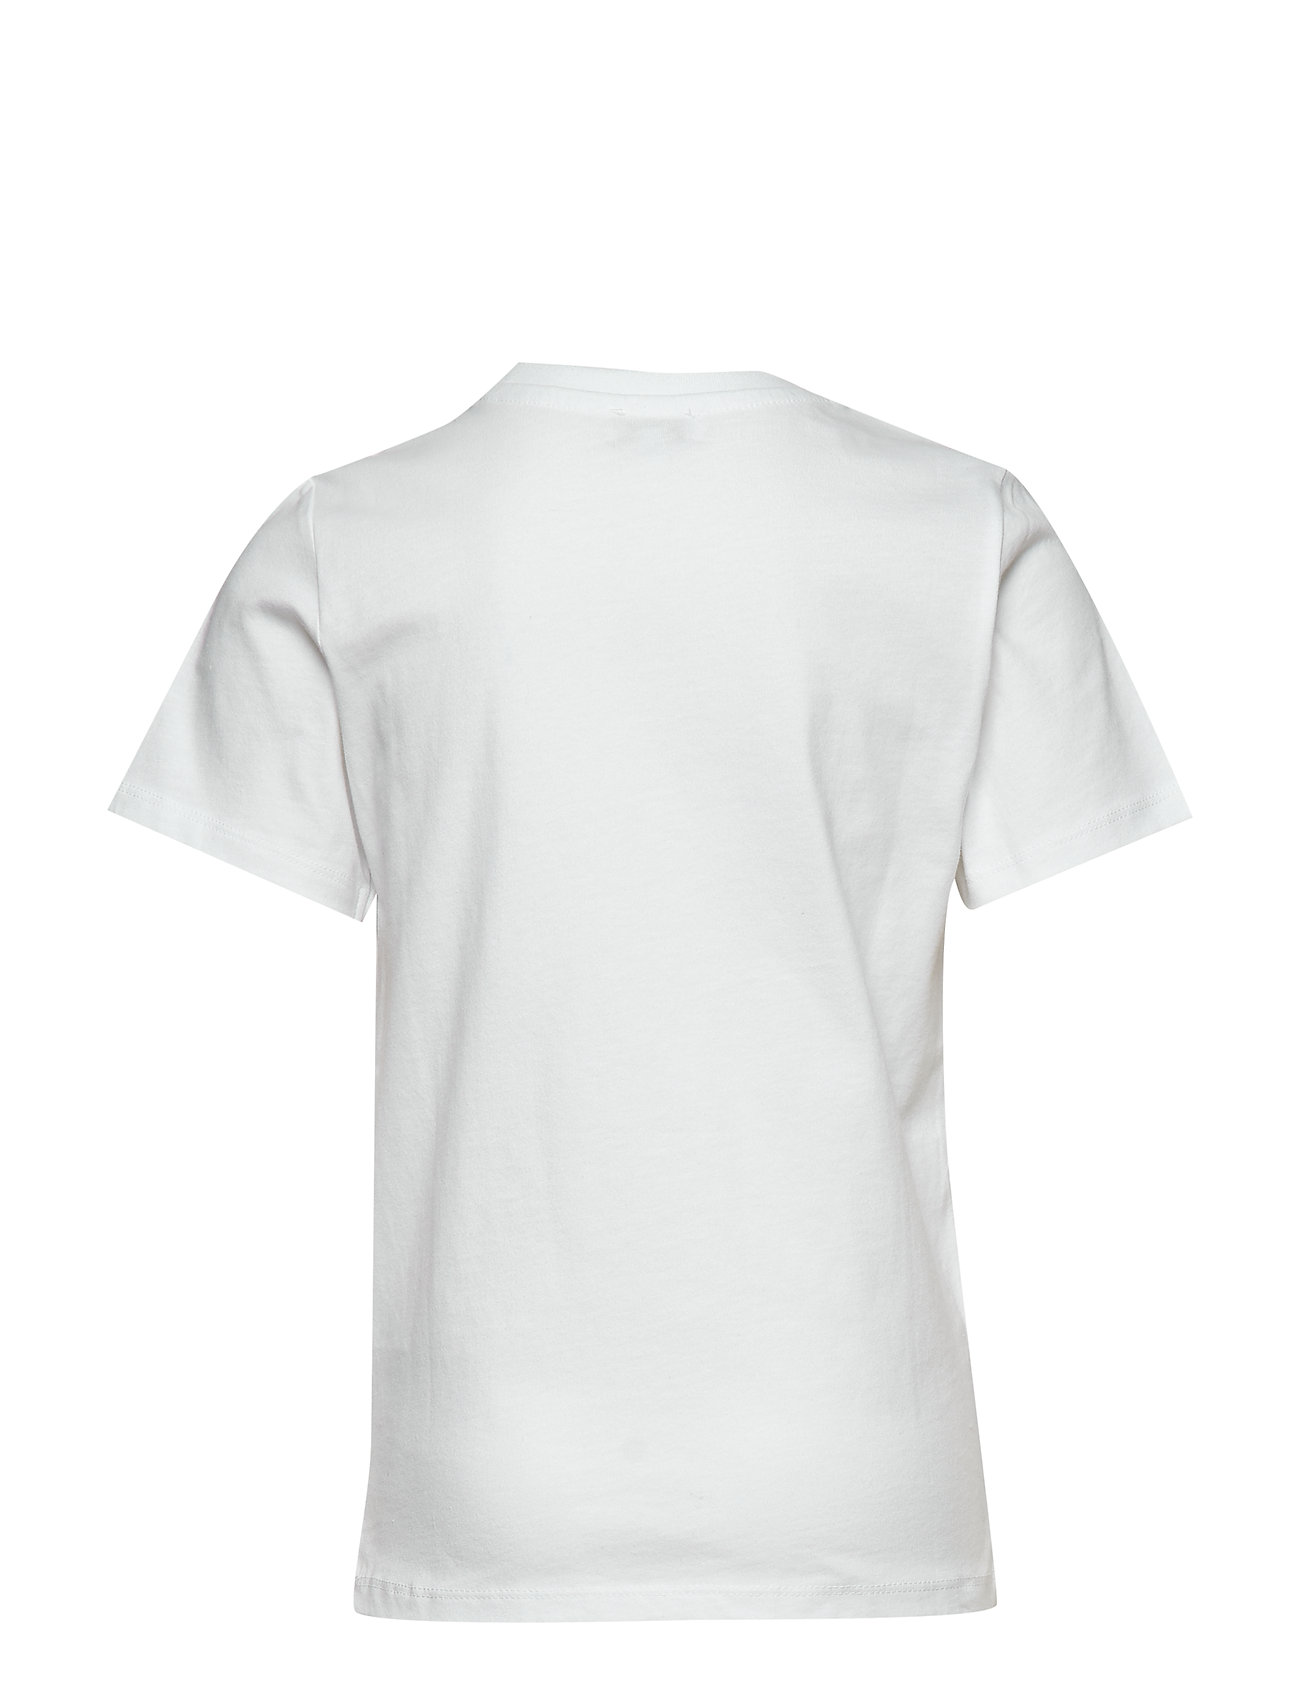 Jao (White) (24.60 €) - Kenzo Lr97L